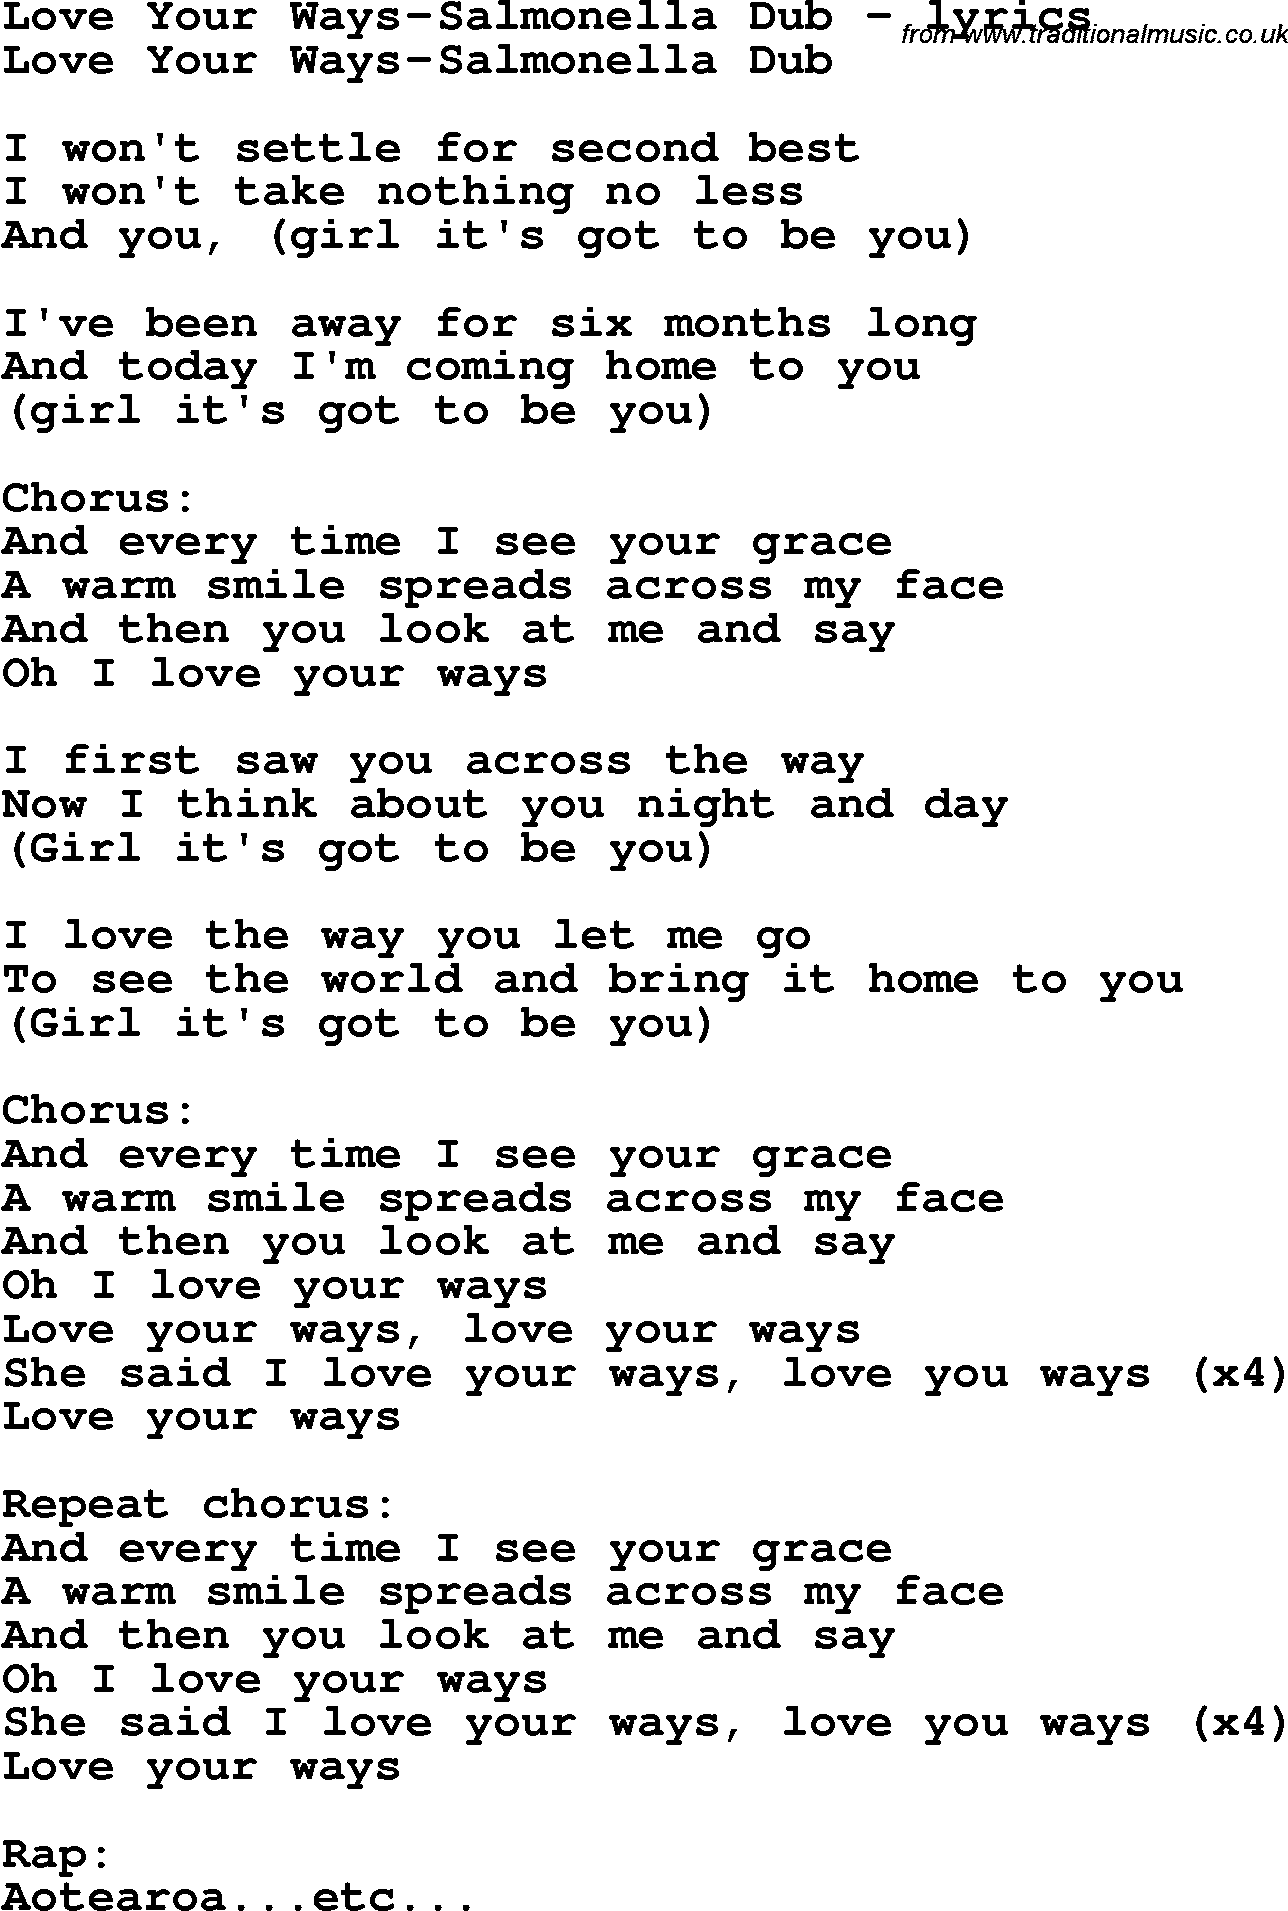 Love Song Lyrics For Love Your Ways Salmonella Dub